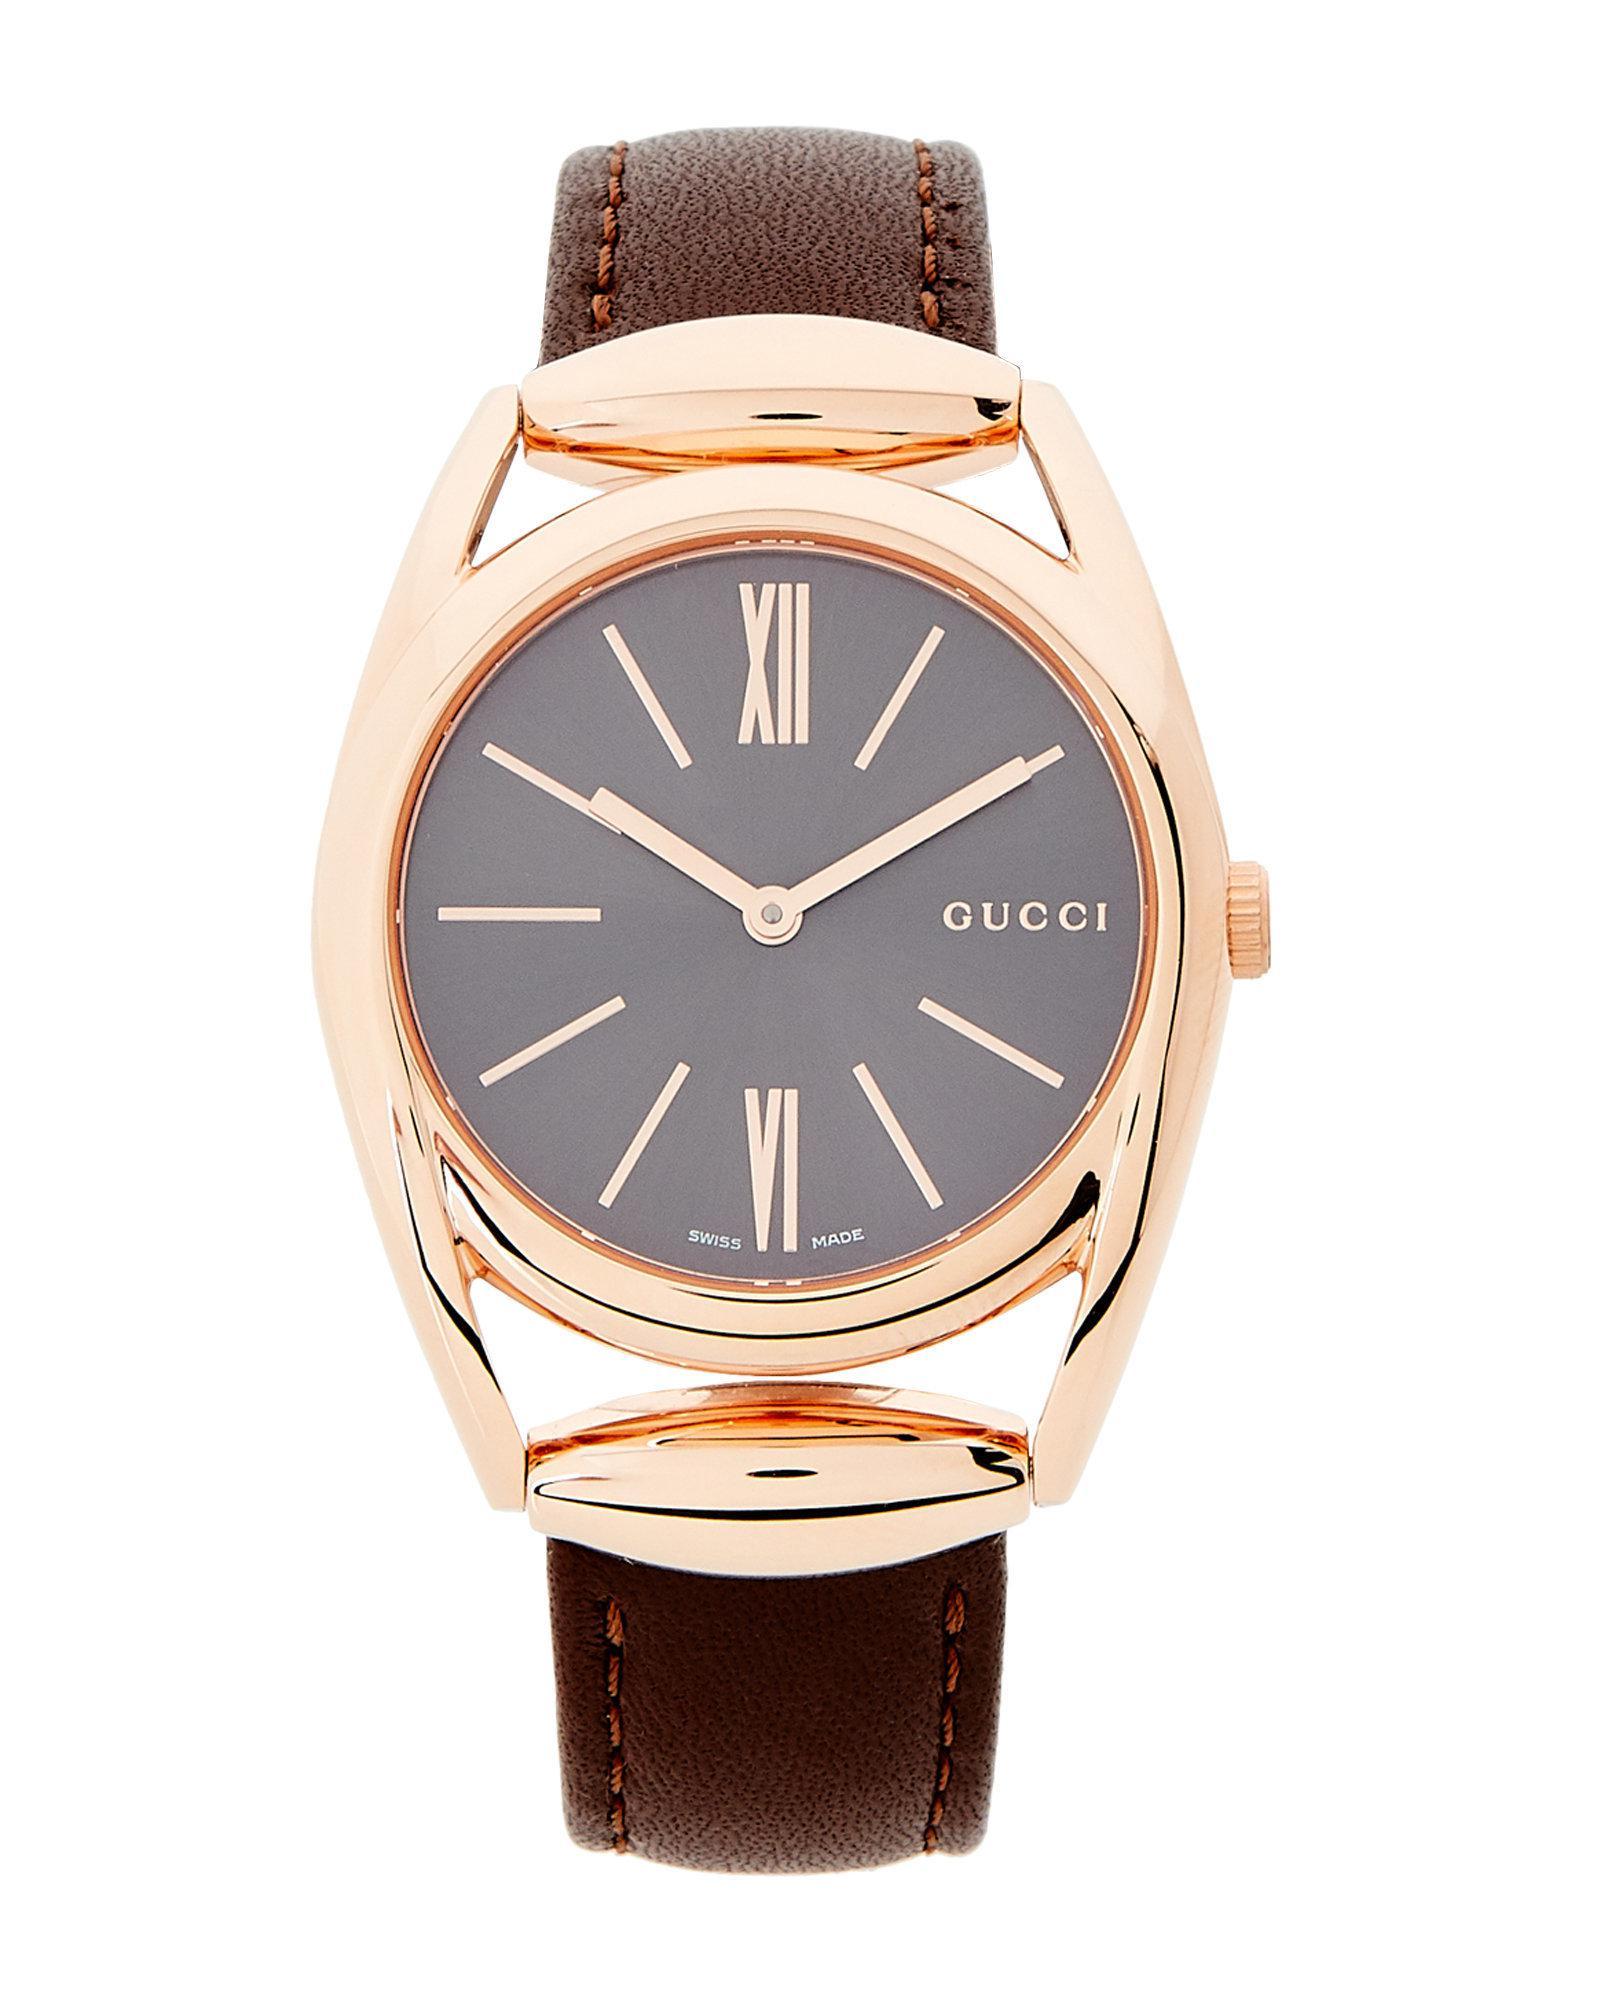 9d20f61d8d6 Lyst - Gucci Ya140408 Horsebit Rose Gold-tone   Brown Watch